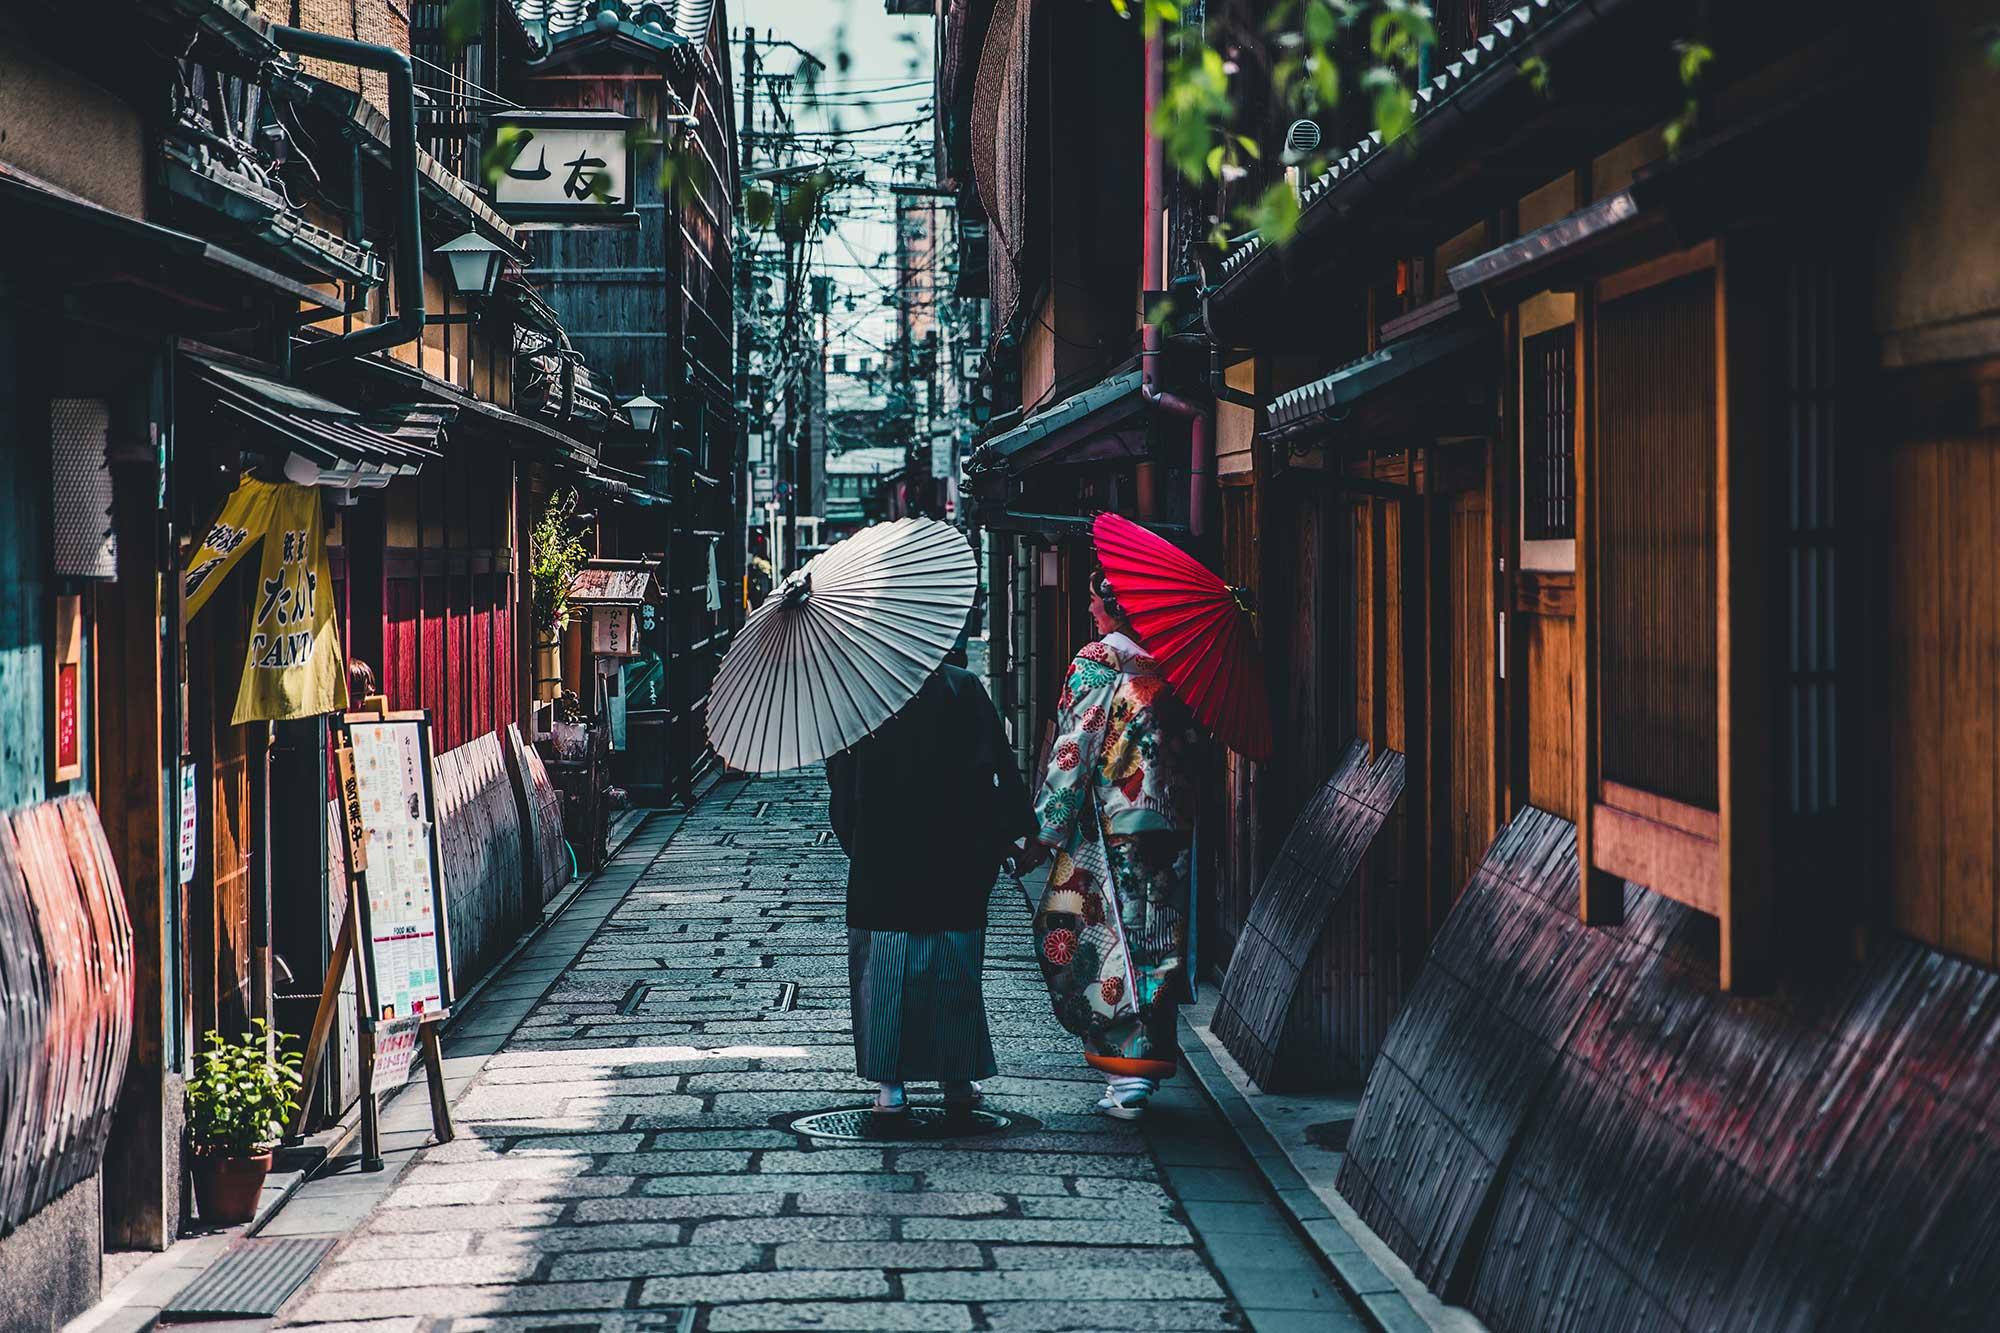 Zabrana Airbnb Japan